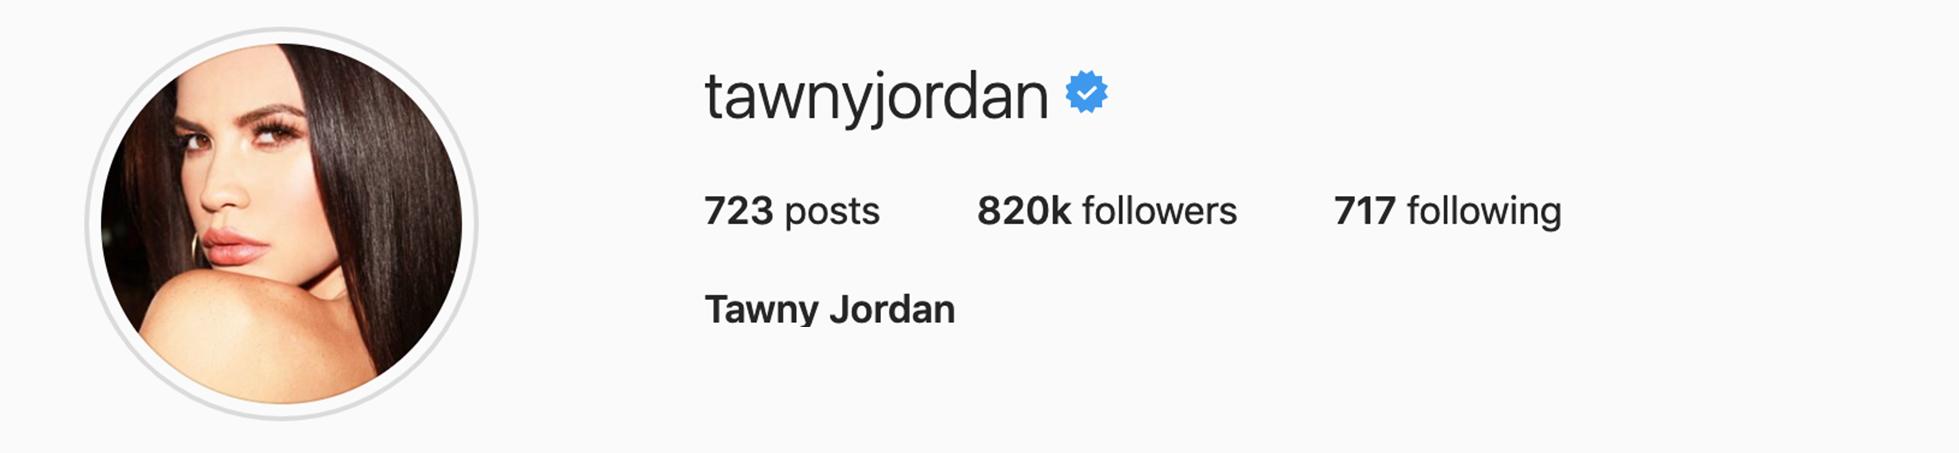 TawnyJordan_Influencer-followers.jpg